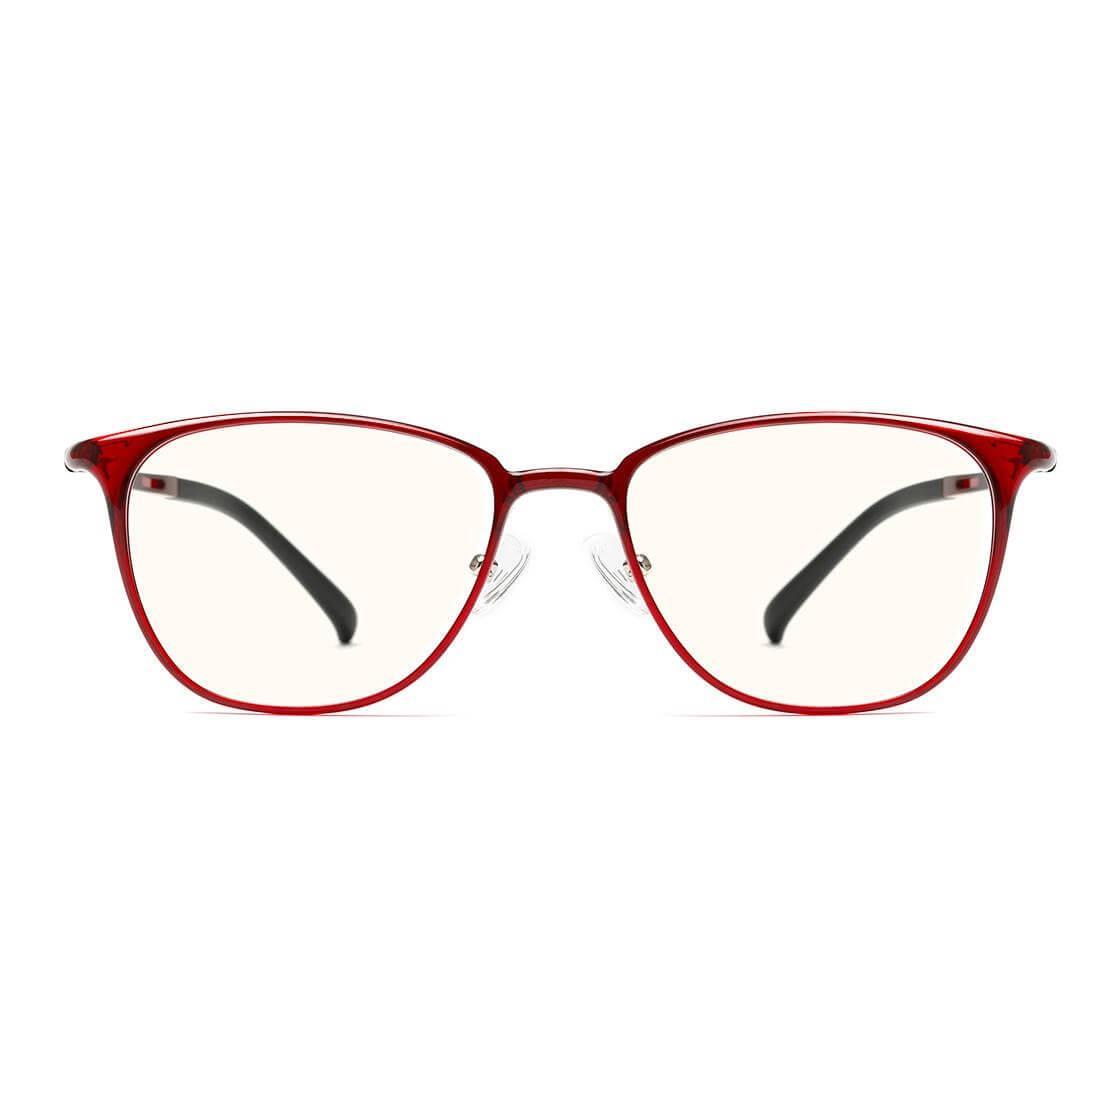 Buy Eyewear For Men Online At Best Price From Daraz.com.np